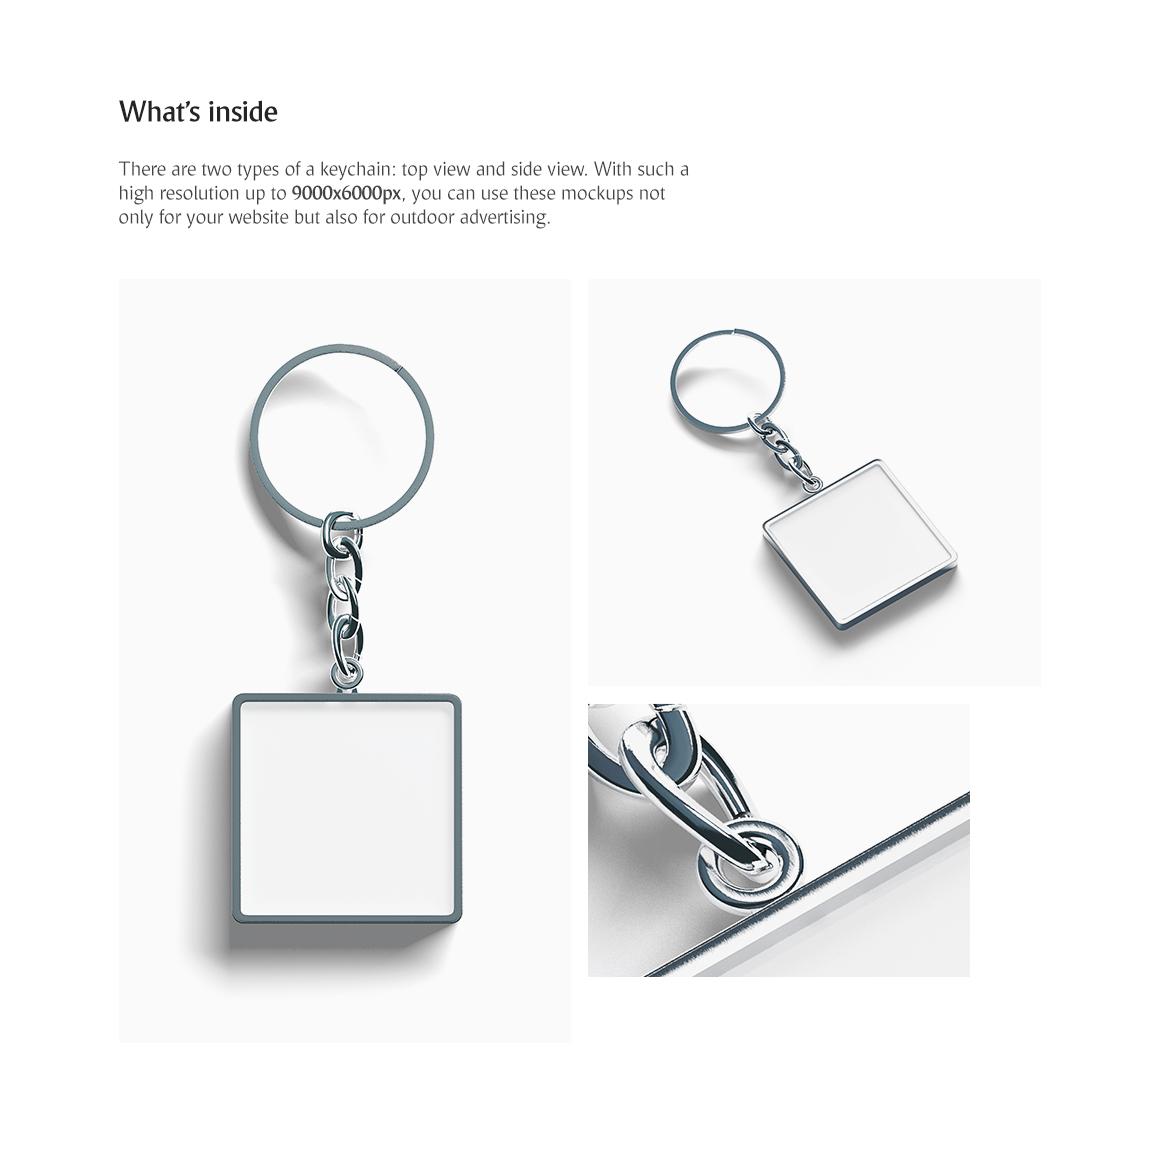 Square Keychain Product Mockups